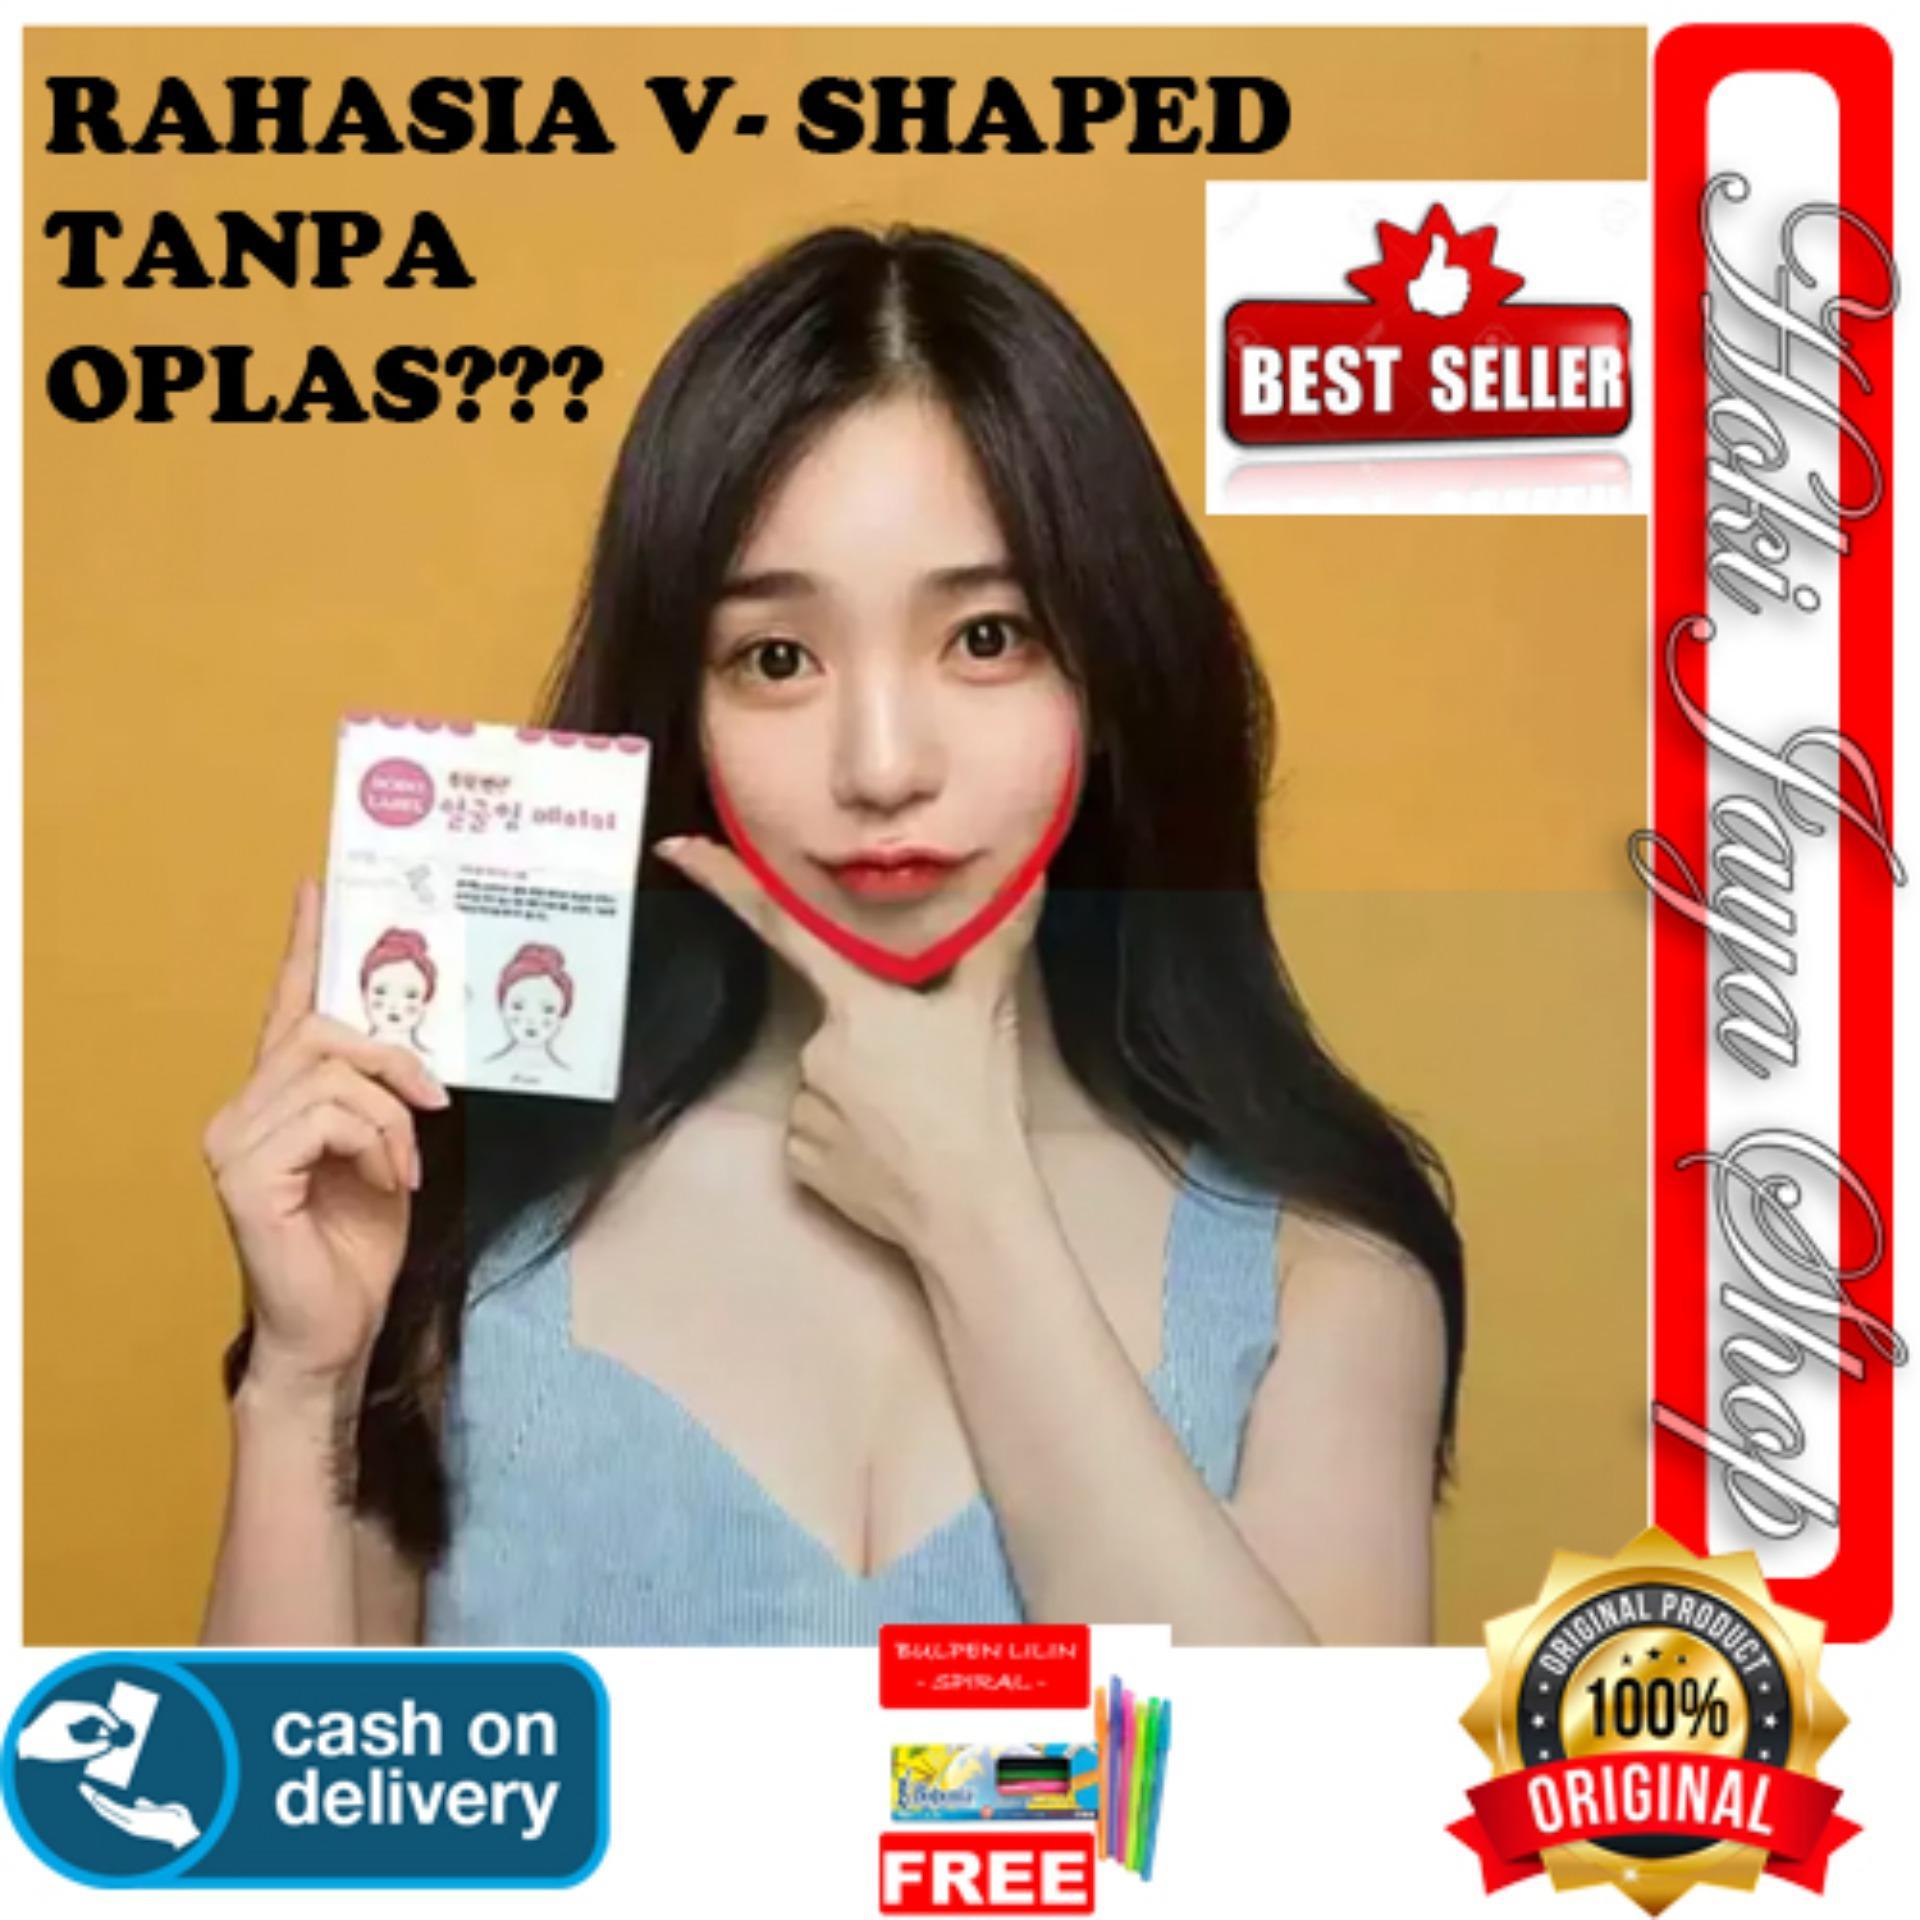 Bb Cc Cream Murah Berkualitas Tanpa Refill Bioaqua Exquisite And Delicate Hoki Cod Dodo Label V Shape Face Original Korea Plaster Penirus Wajah Cushion